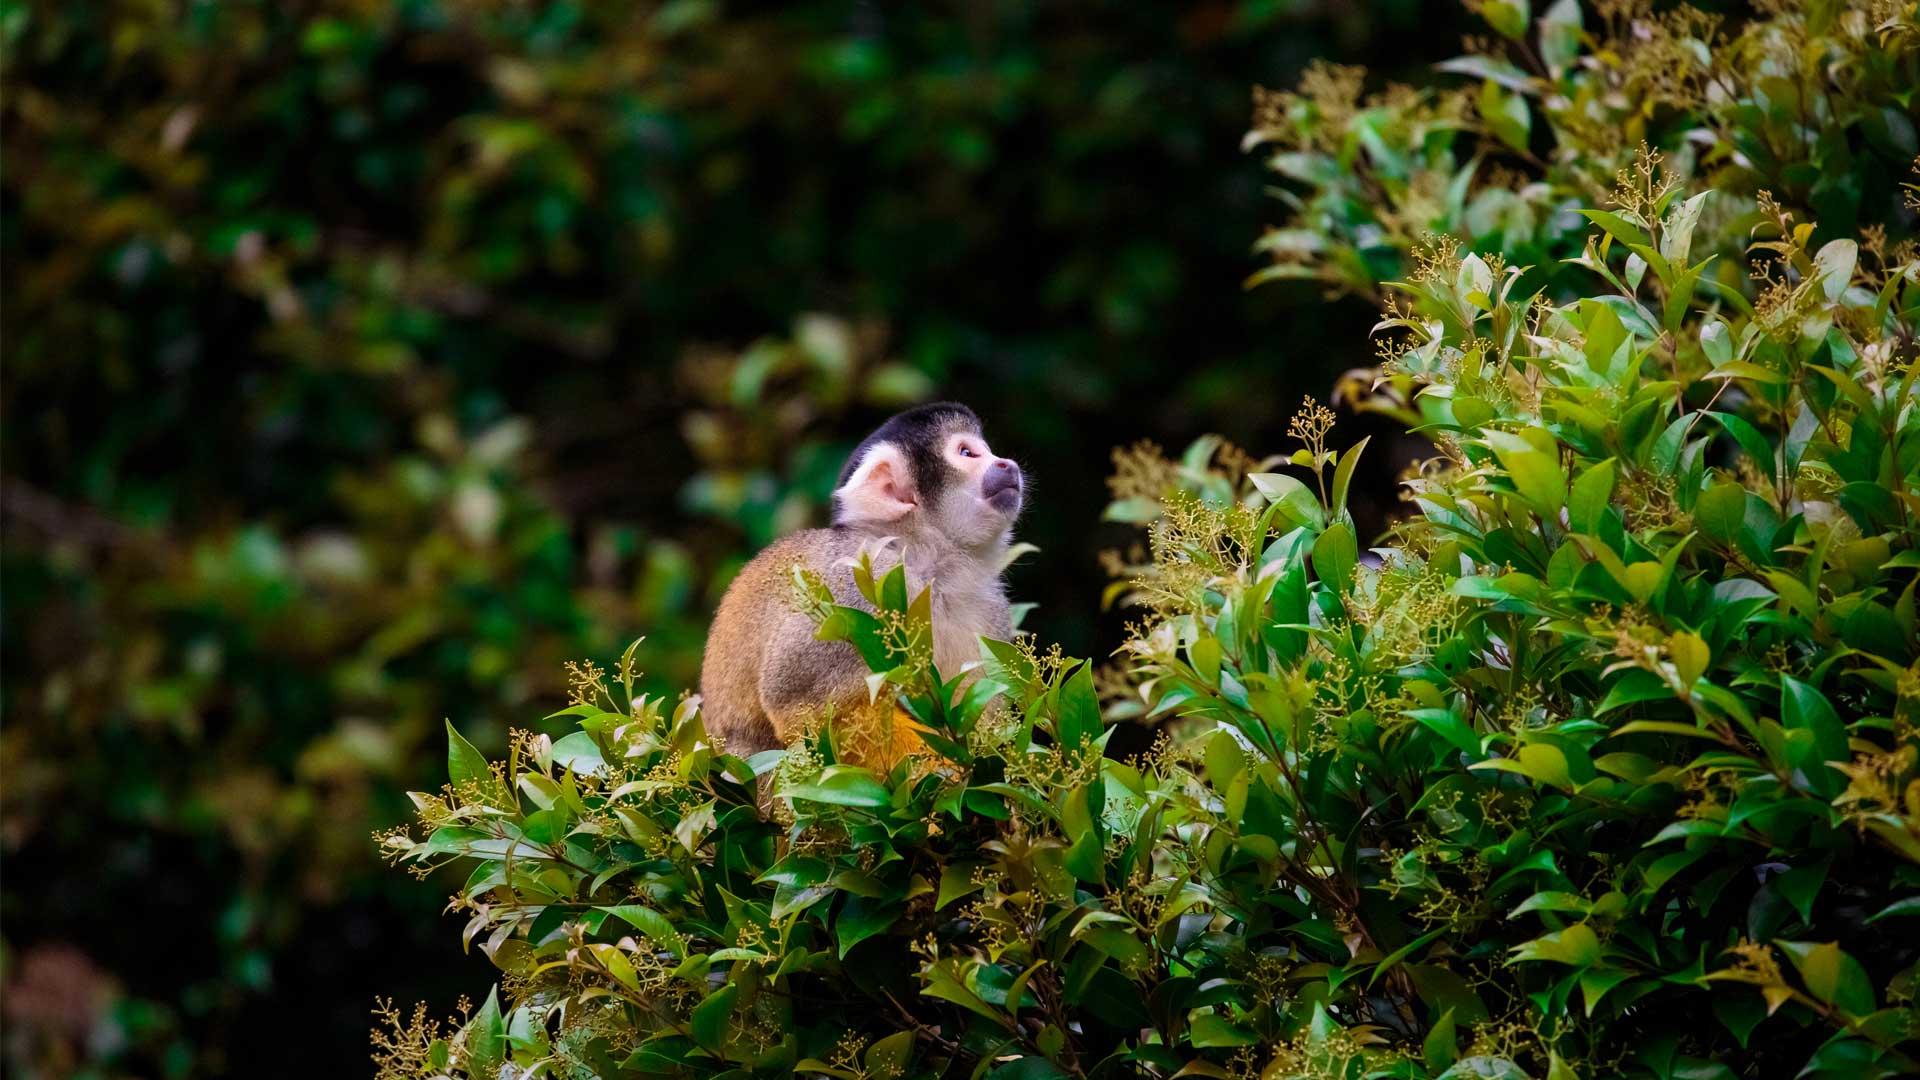 https://rfacdn.nz/zoo/assets/media/squirrel-monkey-gallery-4.jpg